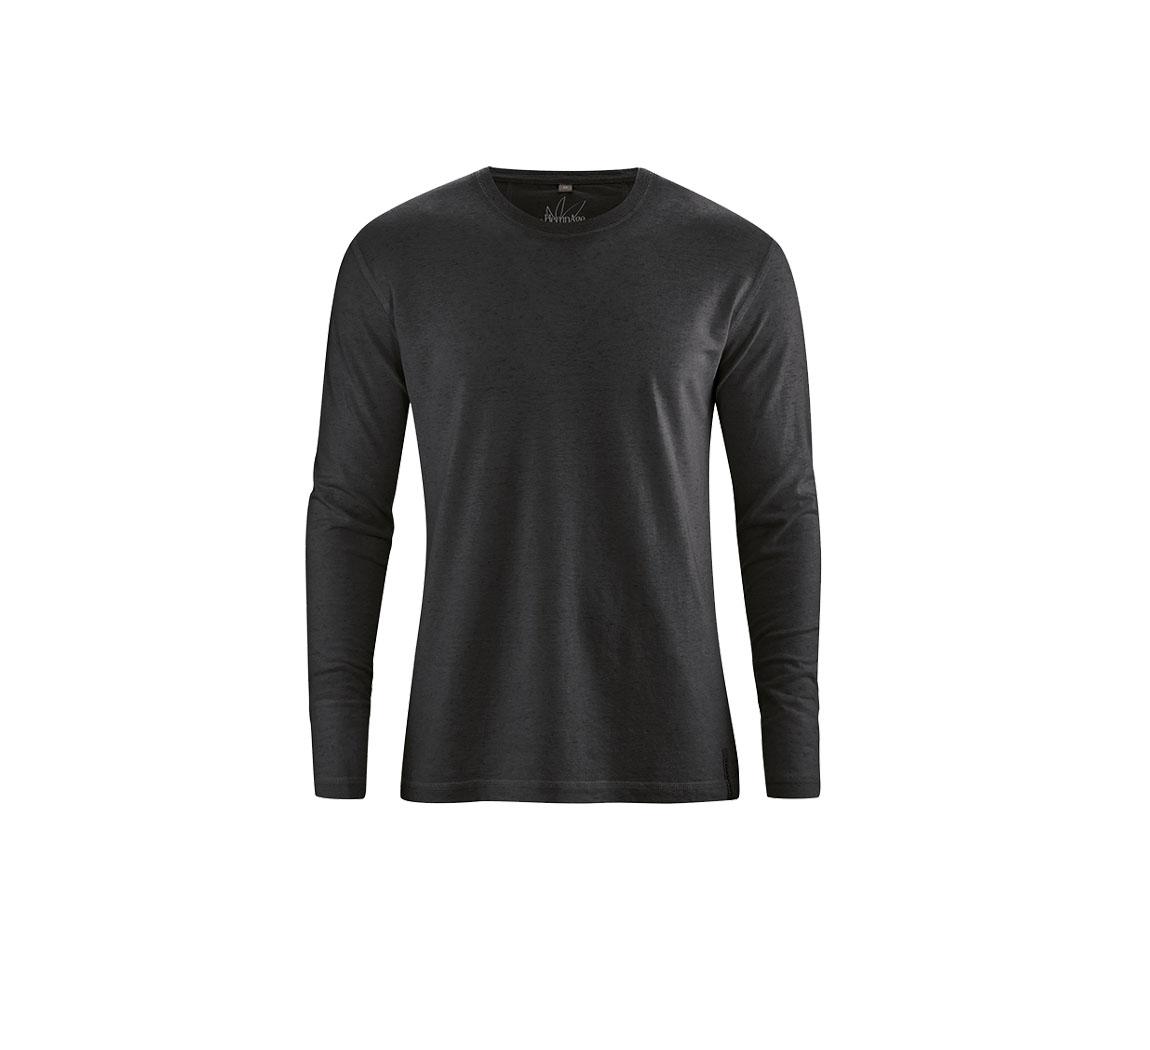 T-shirt homme à manches longues T-shirt Diego